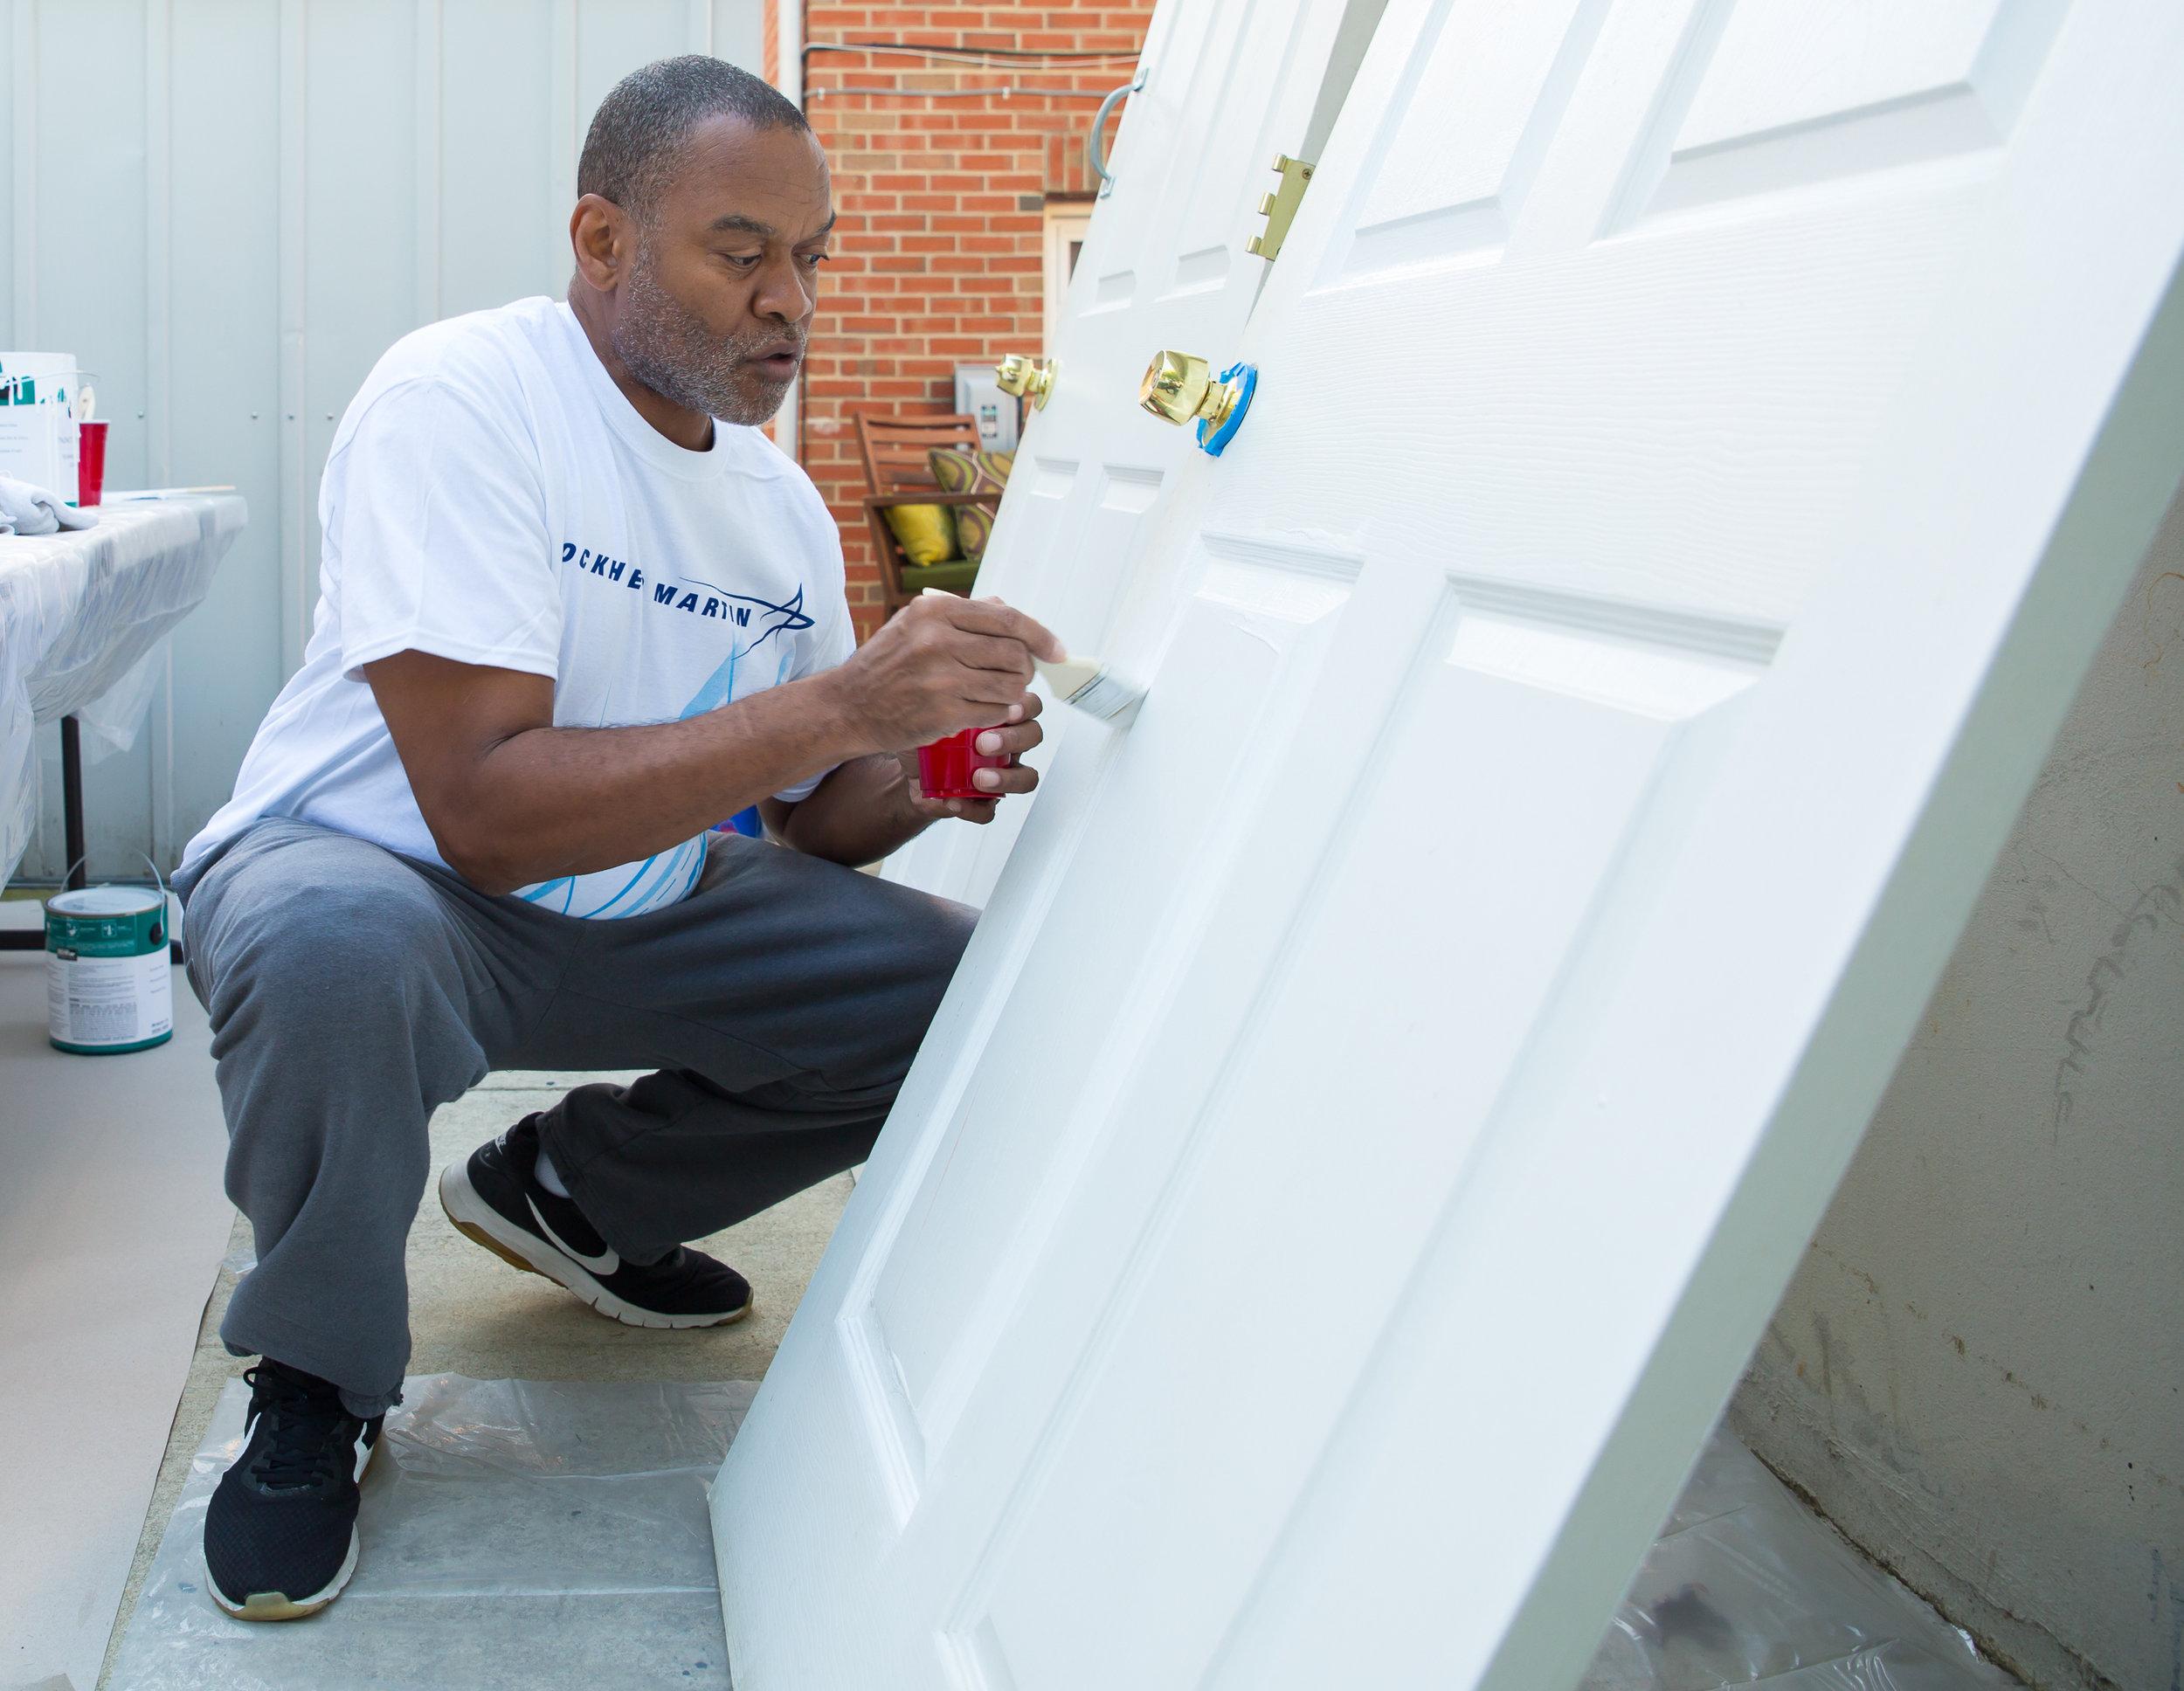 Veterans-Closeup-of-Man-Painting-Door-Lockheed-Bethesda.jpg